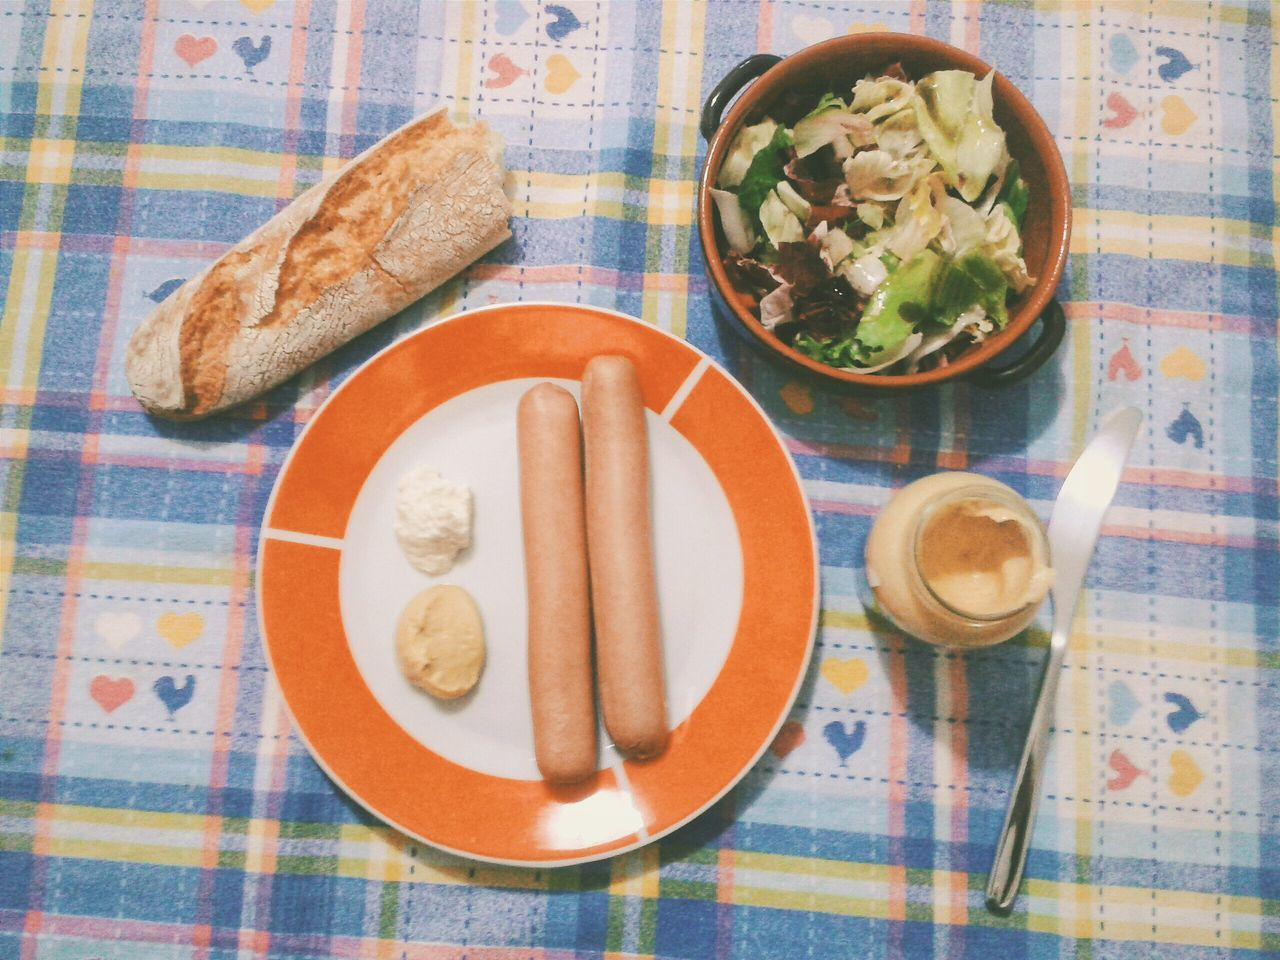 """Abendessen"". Missing real Frankfurter Sausages, just Hot-dog style Würstel. Pane Brot Baguette Kren Rafano Horseradish Senf Moutarde Senape Dinner Food Porn Food Photography Mobile Photography S3mini Camerazoomfx VSCO and EyeEm Editing / Directly Above"